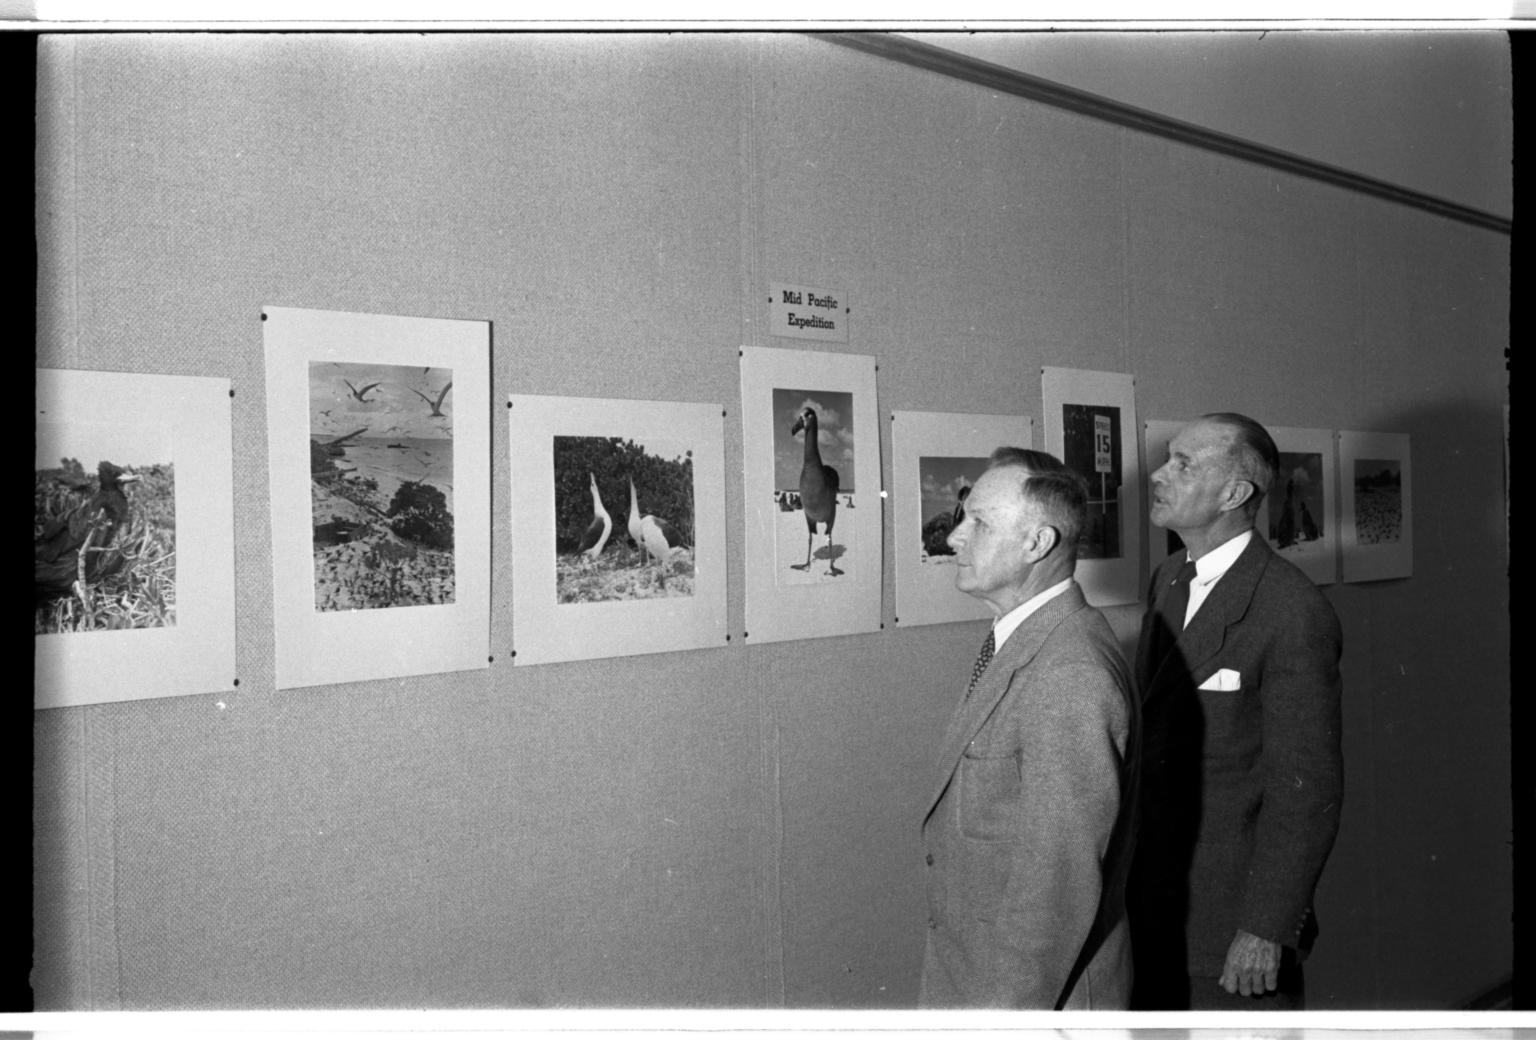 Albert Rogers and Robert J. Niedrach